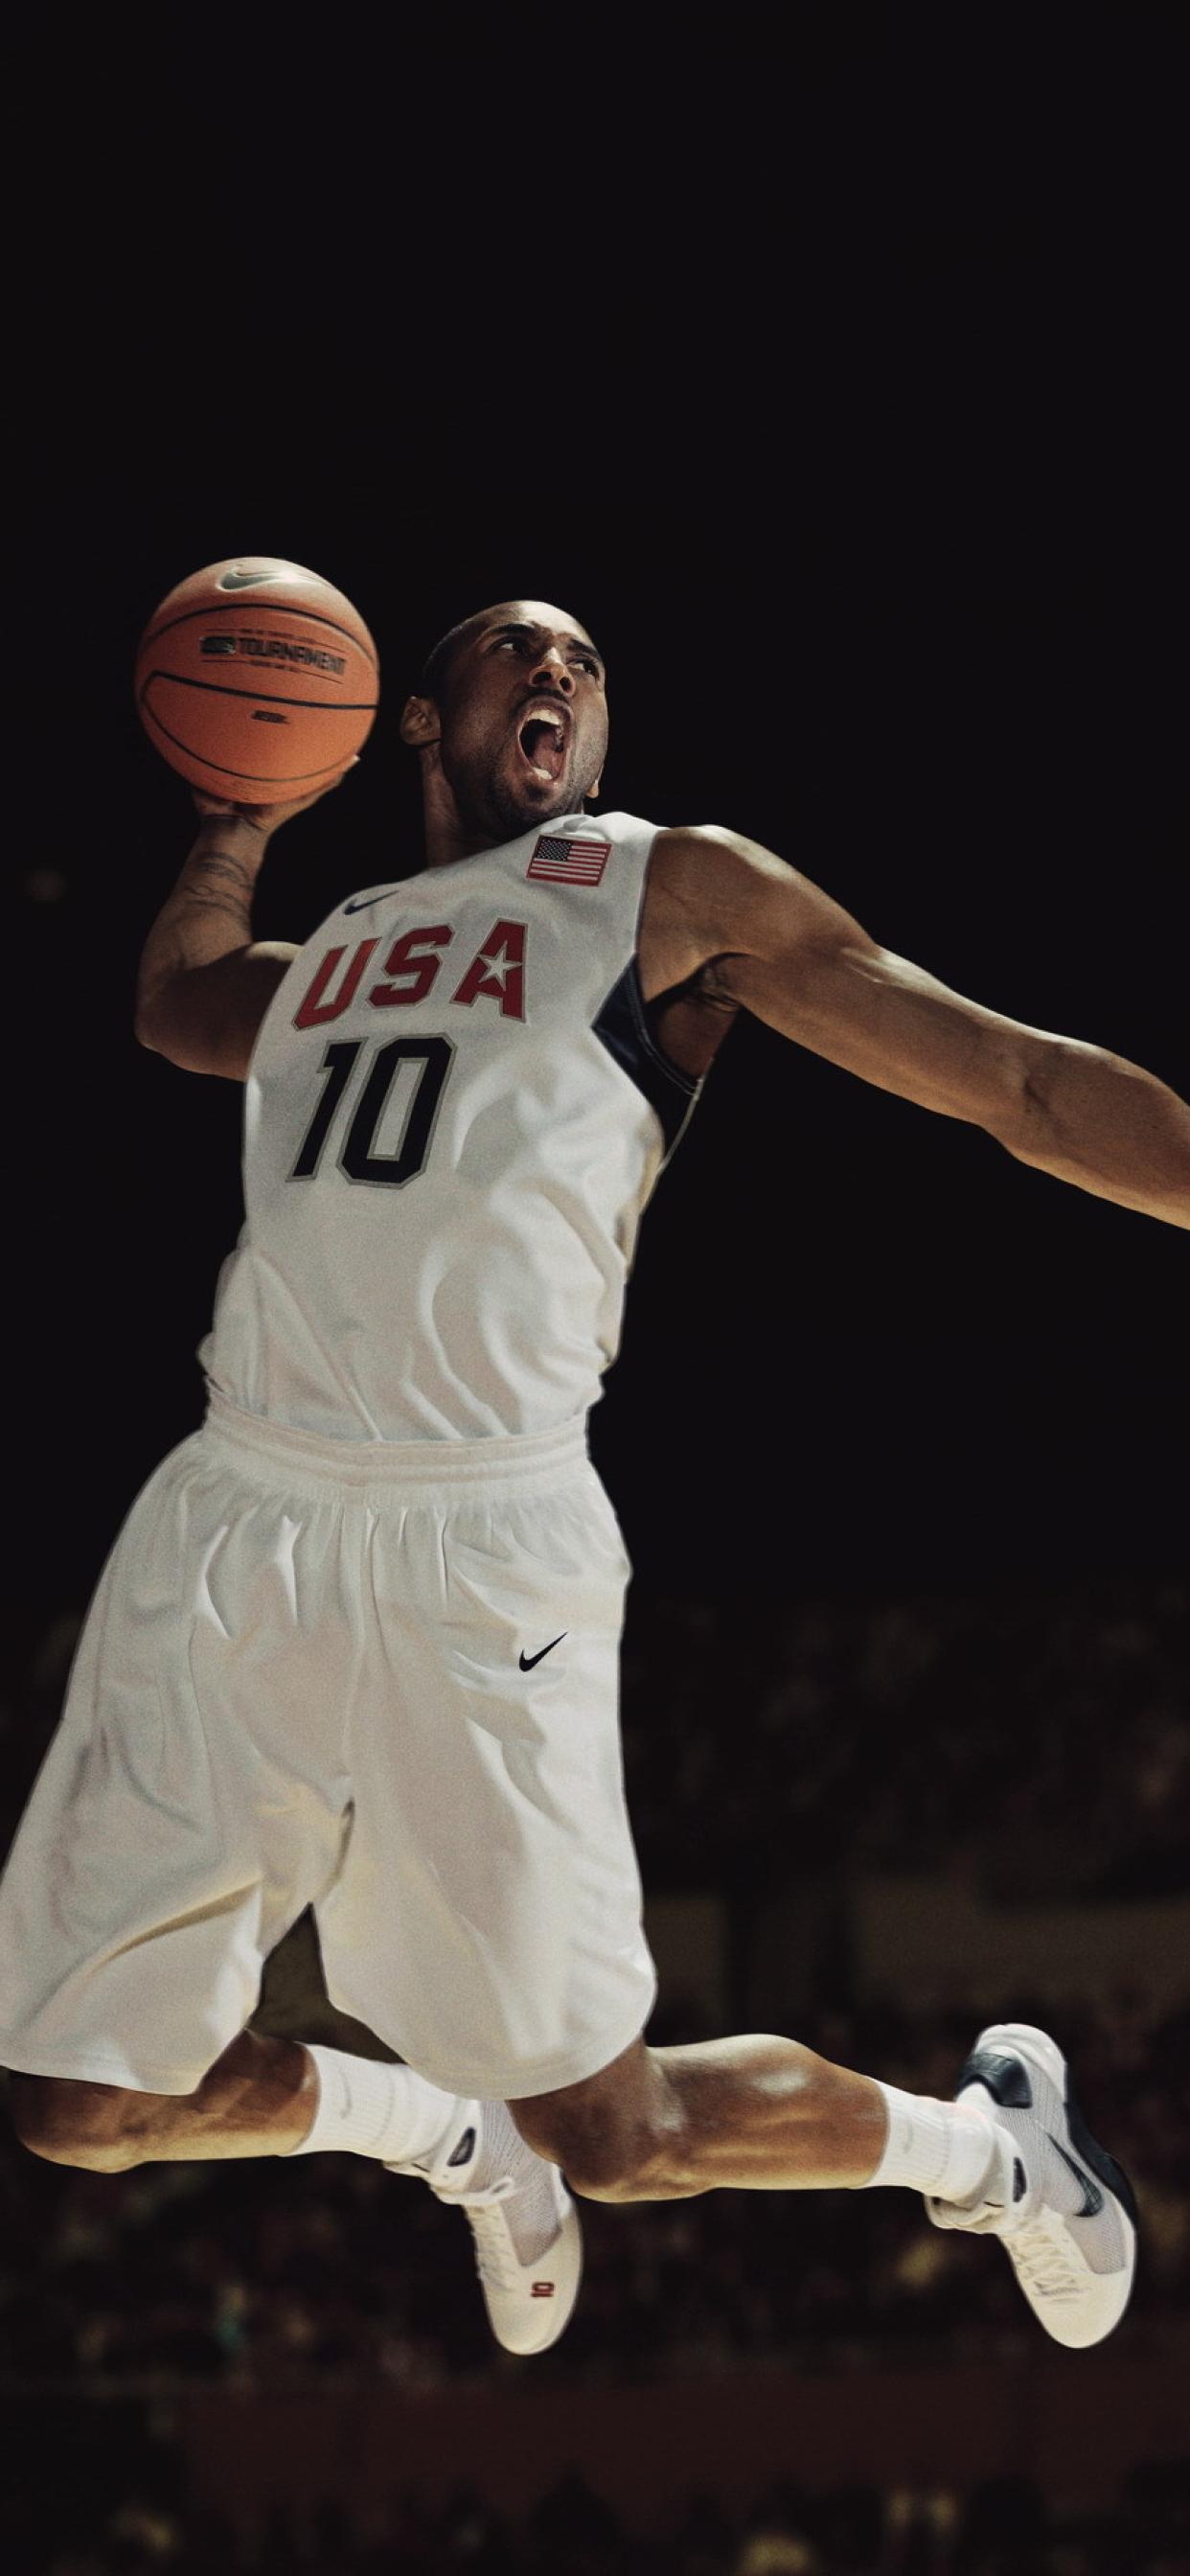 1242x2688 Kobe Bryant Basketball Usa Iphone Xs Max Wallpaper Hd